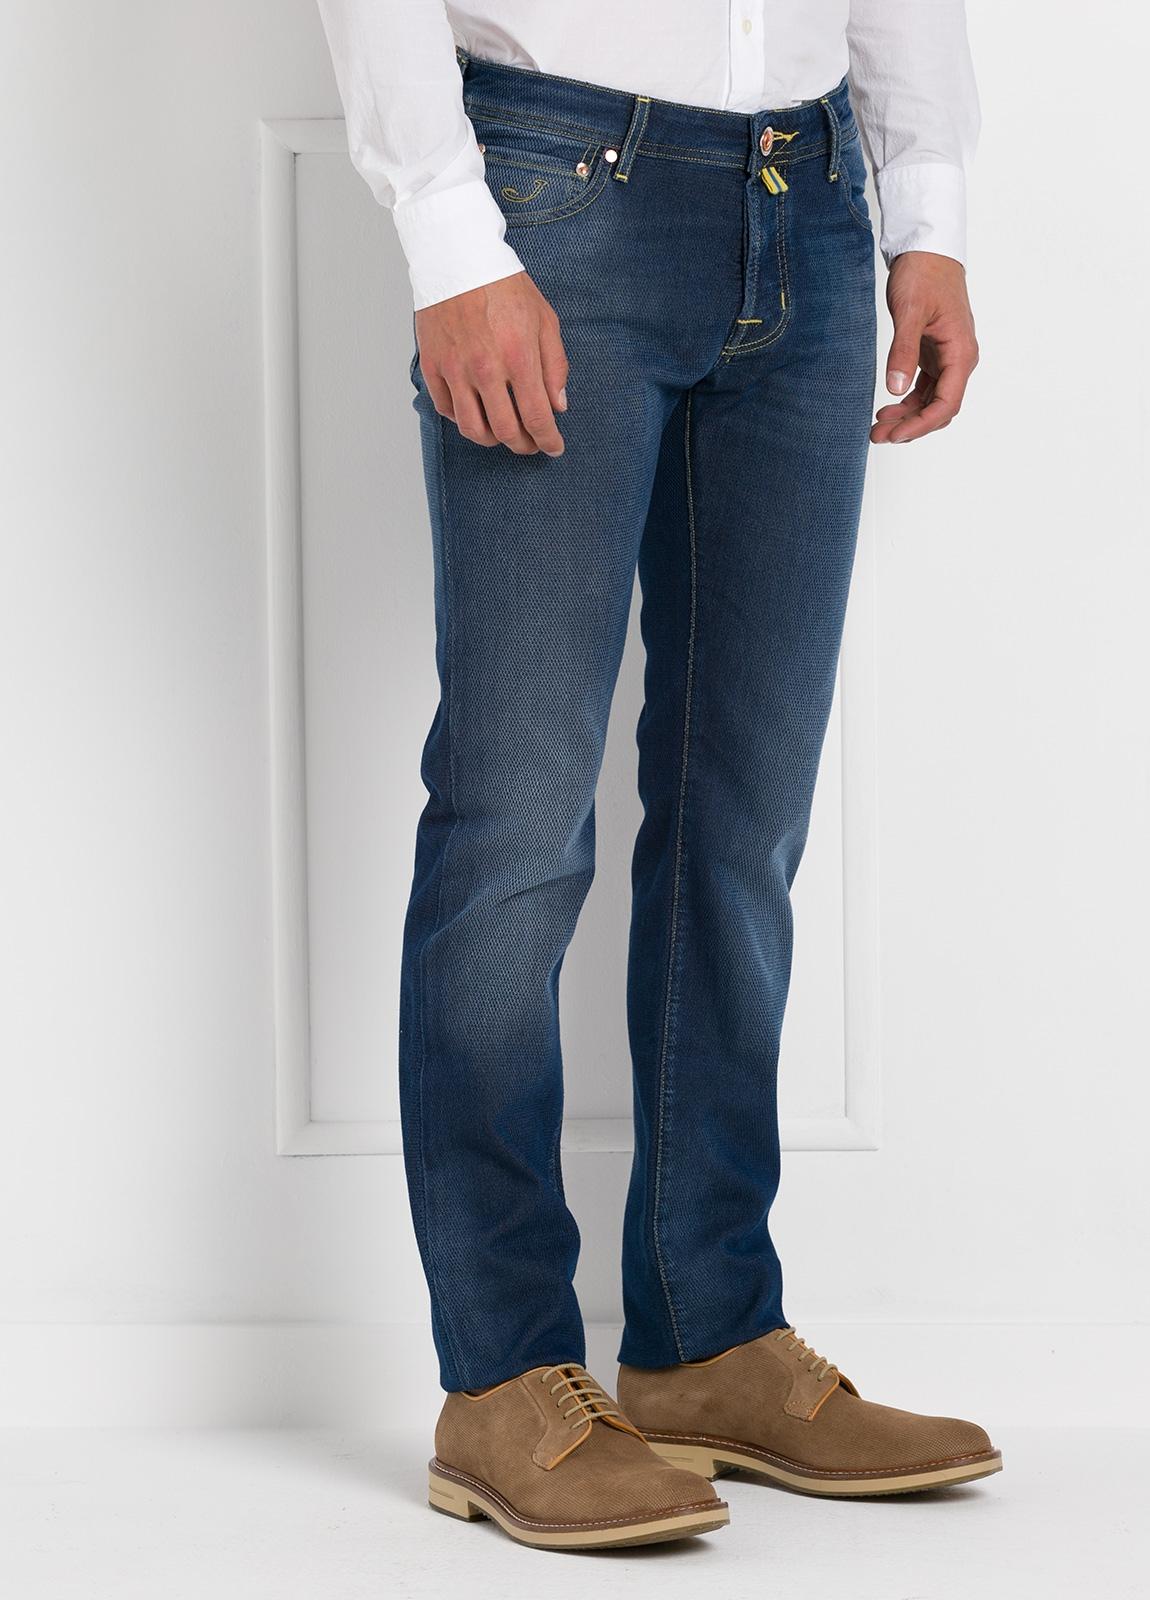 Tejano ligeramente slim fit modelo J622 color azul oscuro denim. 56% algodón,44% Poliéster. - Ítem1